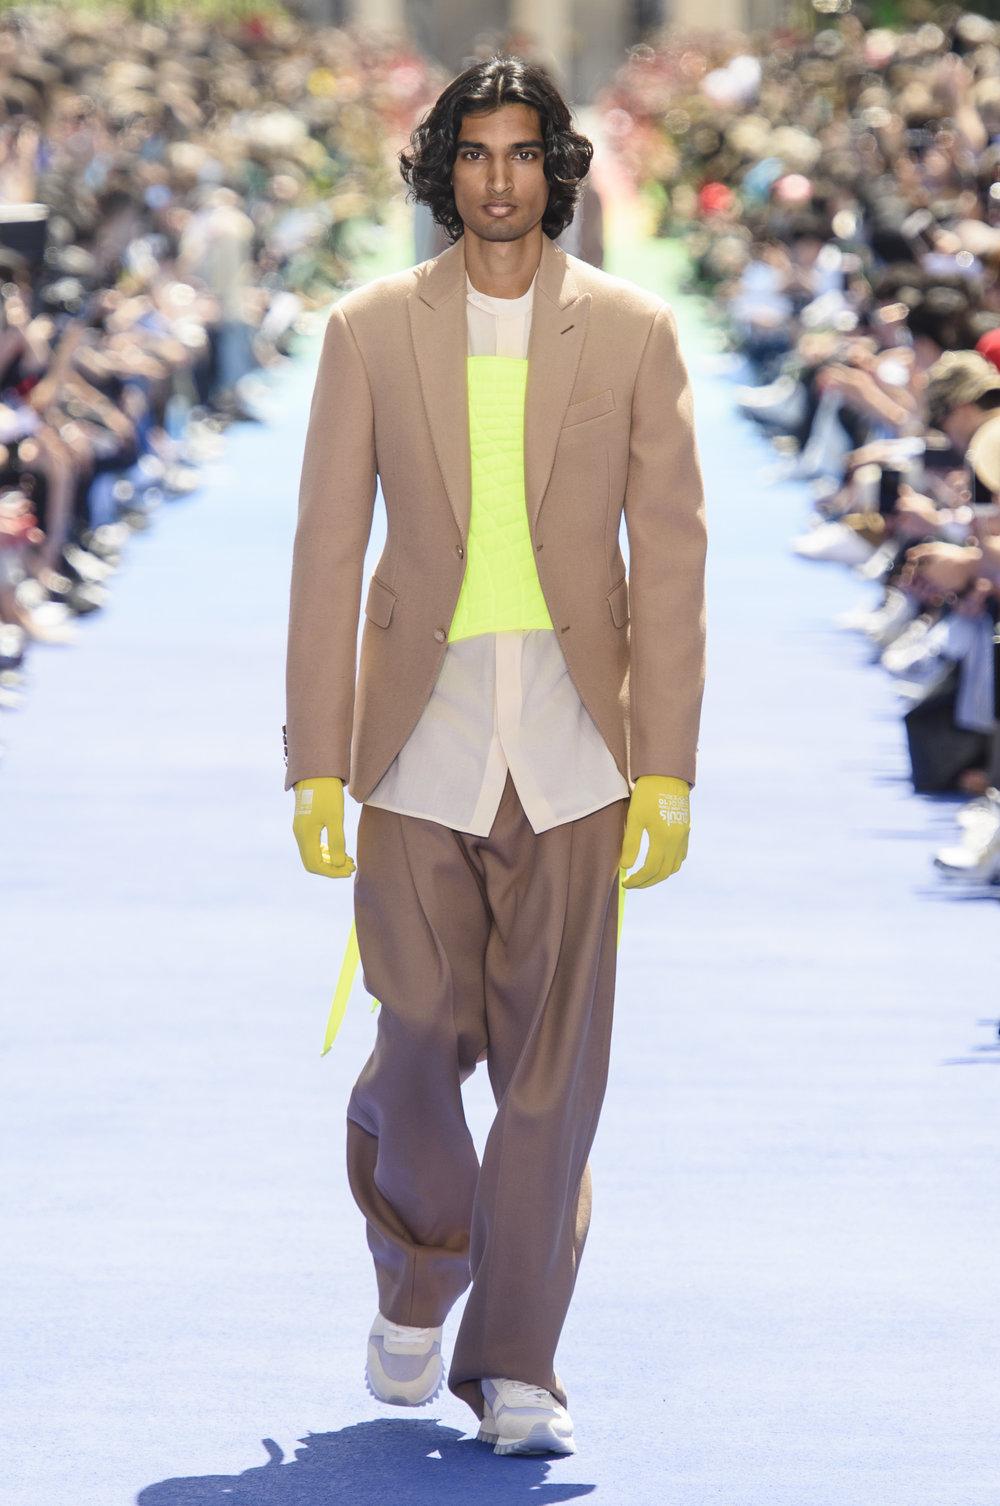 19_Louis_Vuitton_original_vui_prs_ss19_058.jpg